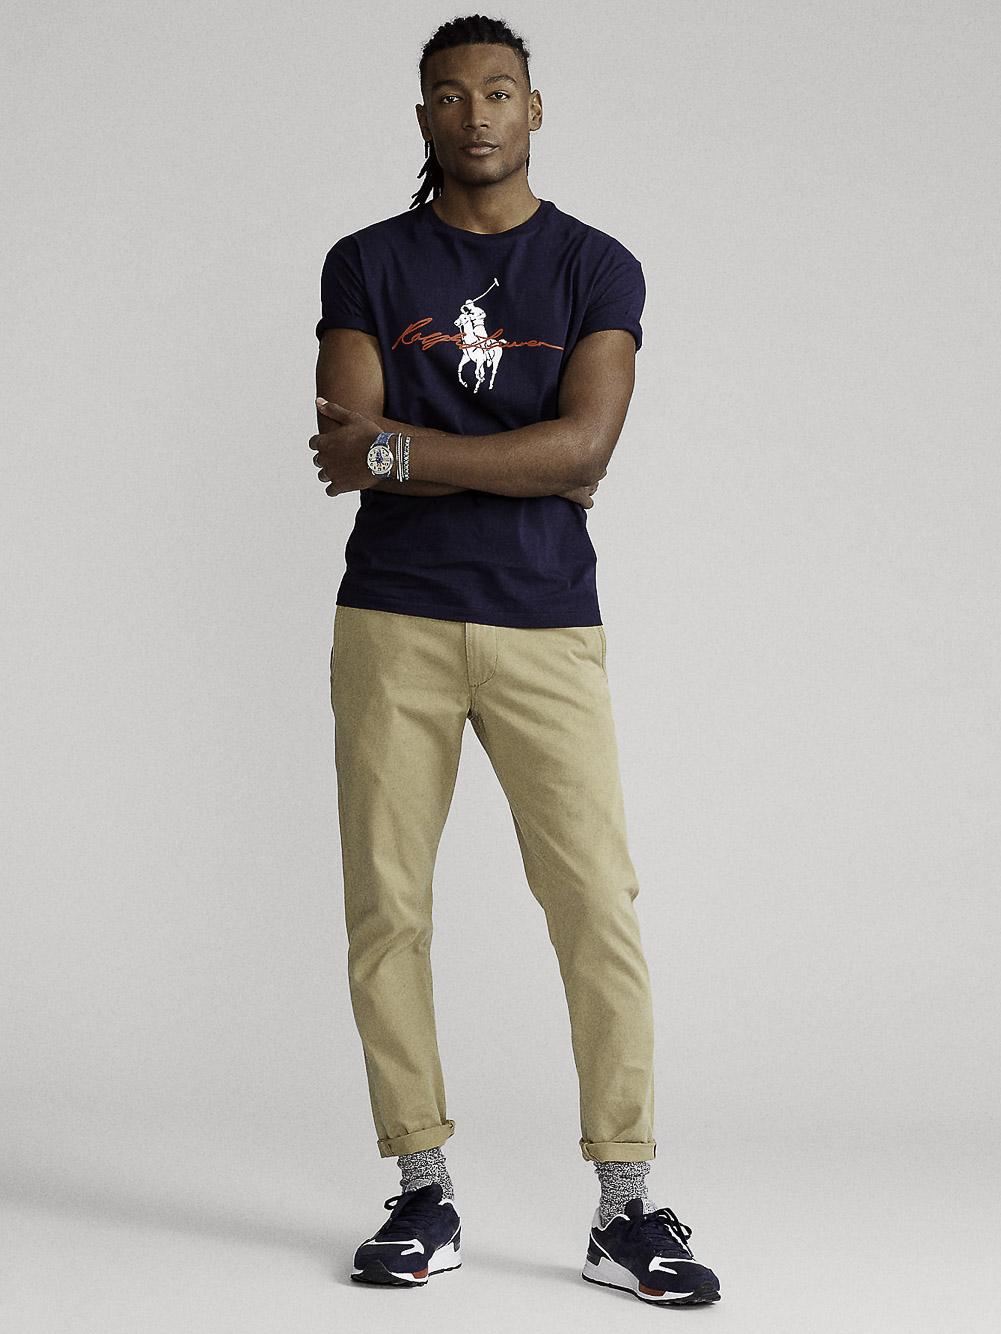 POLO RALPH LAUREN Μπλούζα T-Shirt 710839050002 ΜΠΛΕ